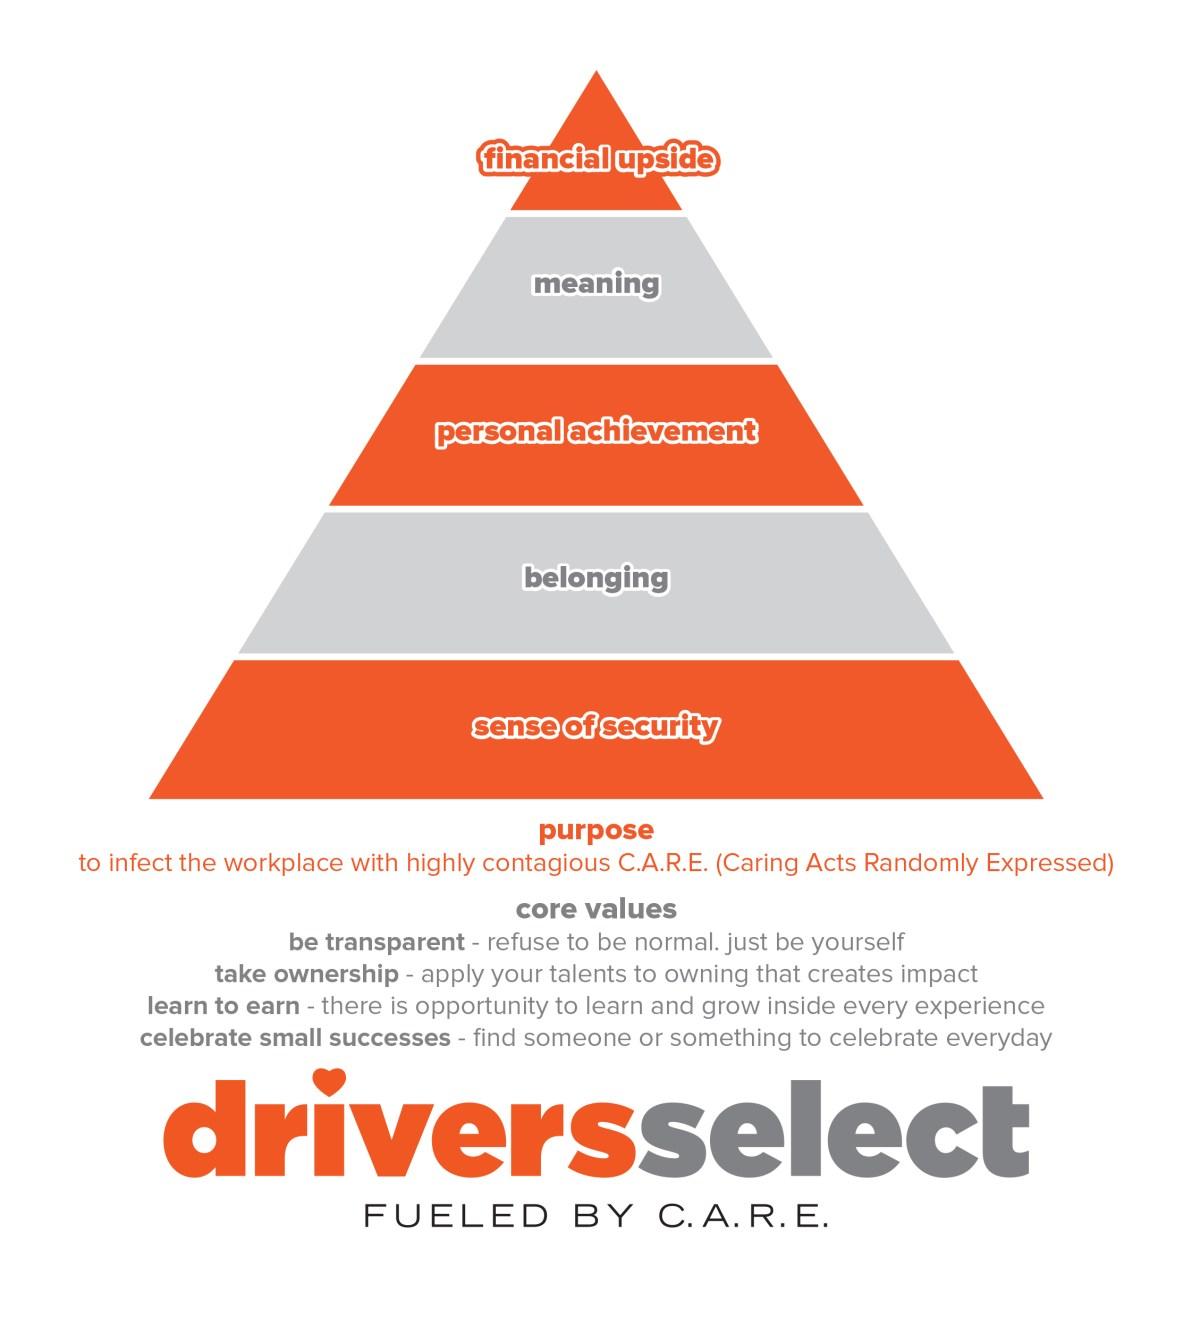 driversselect